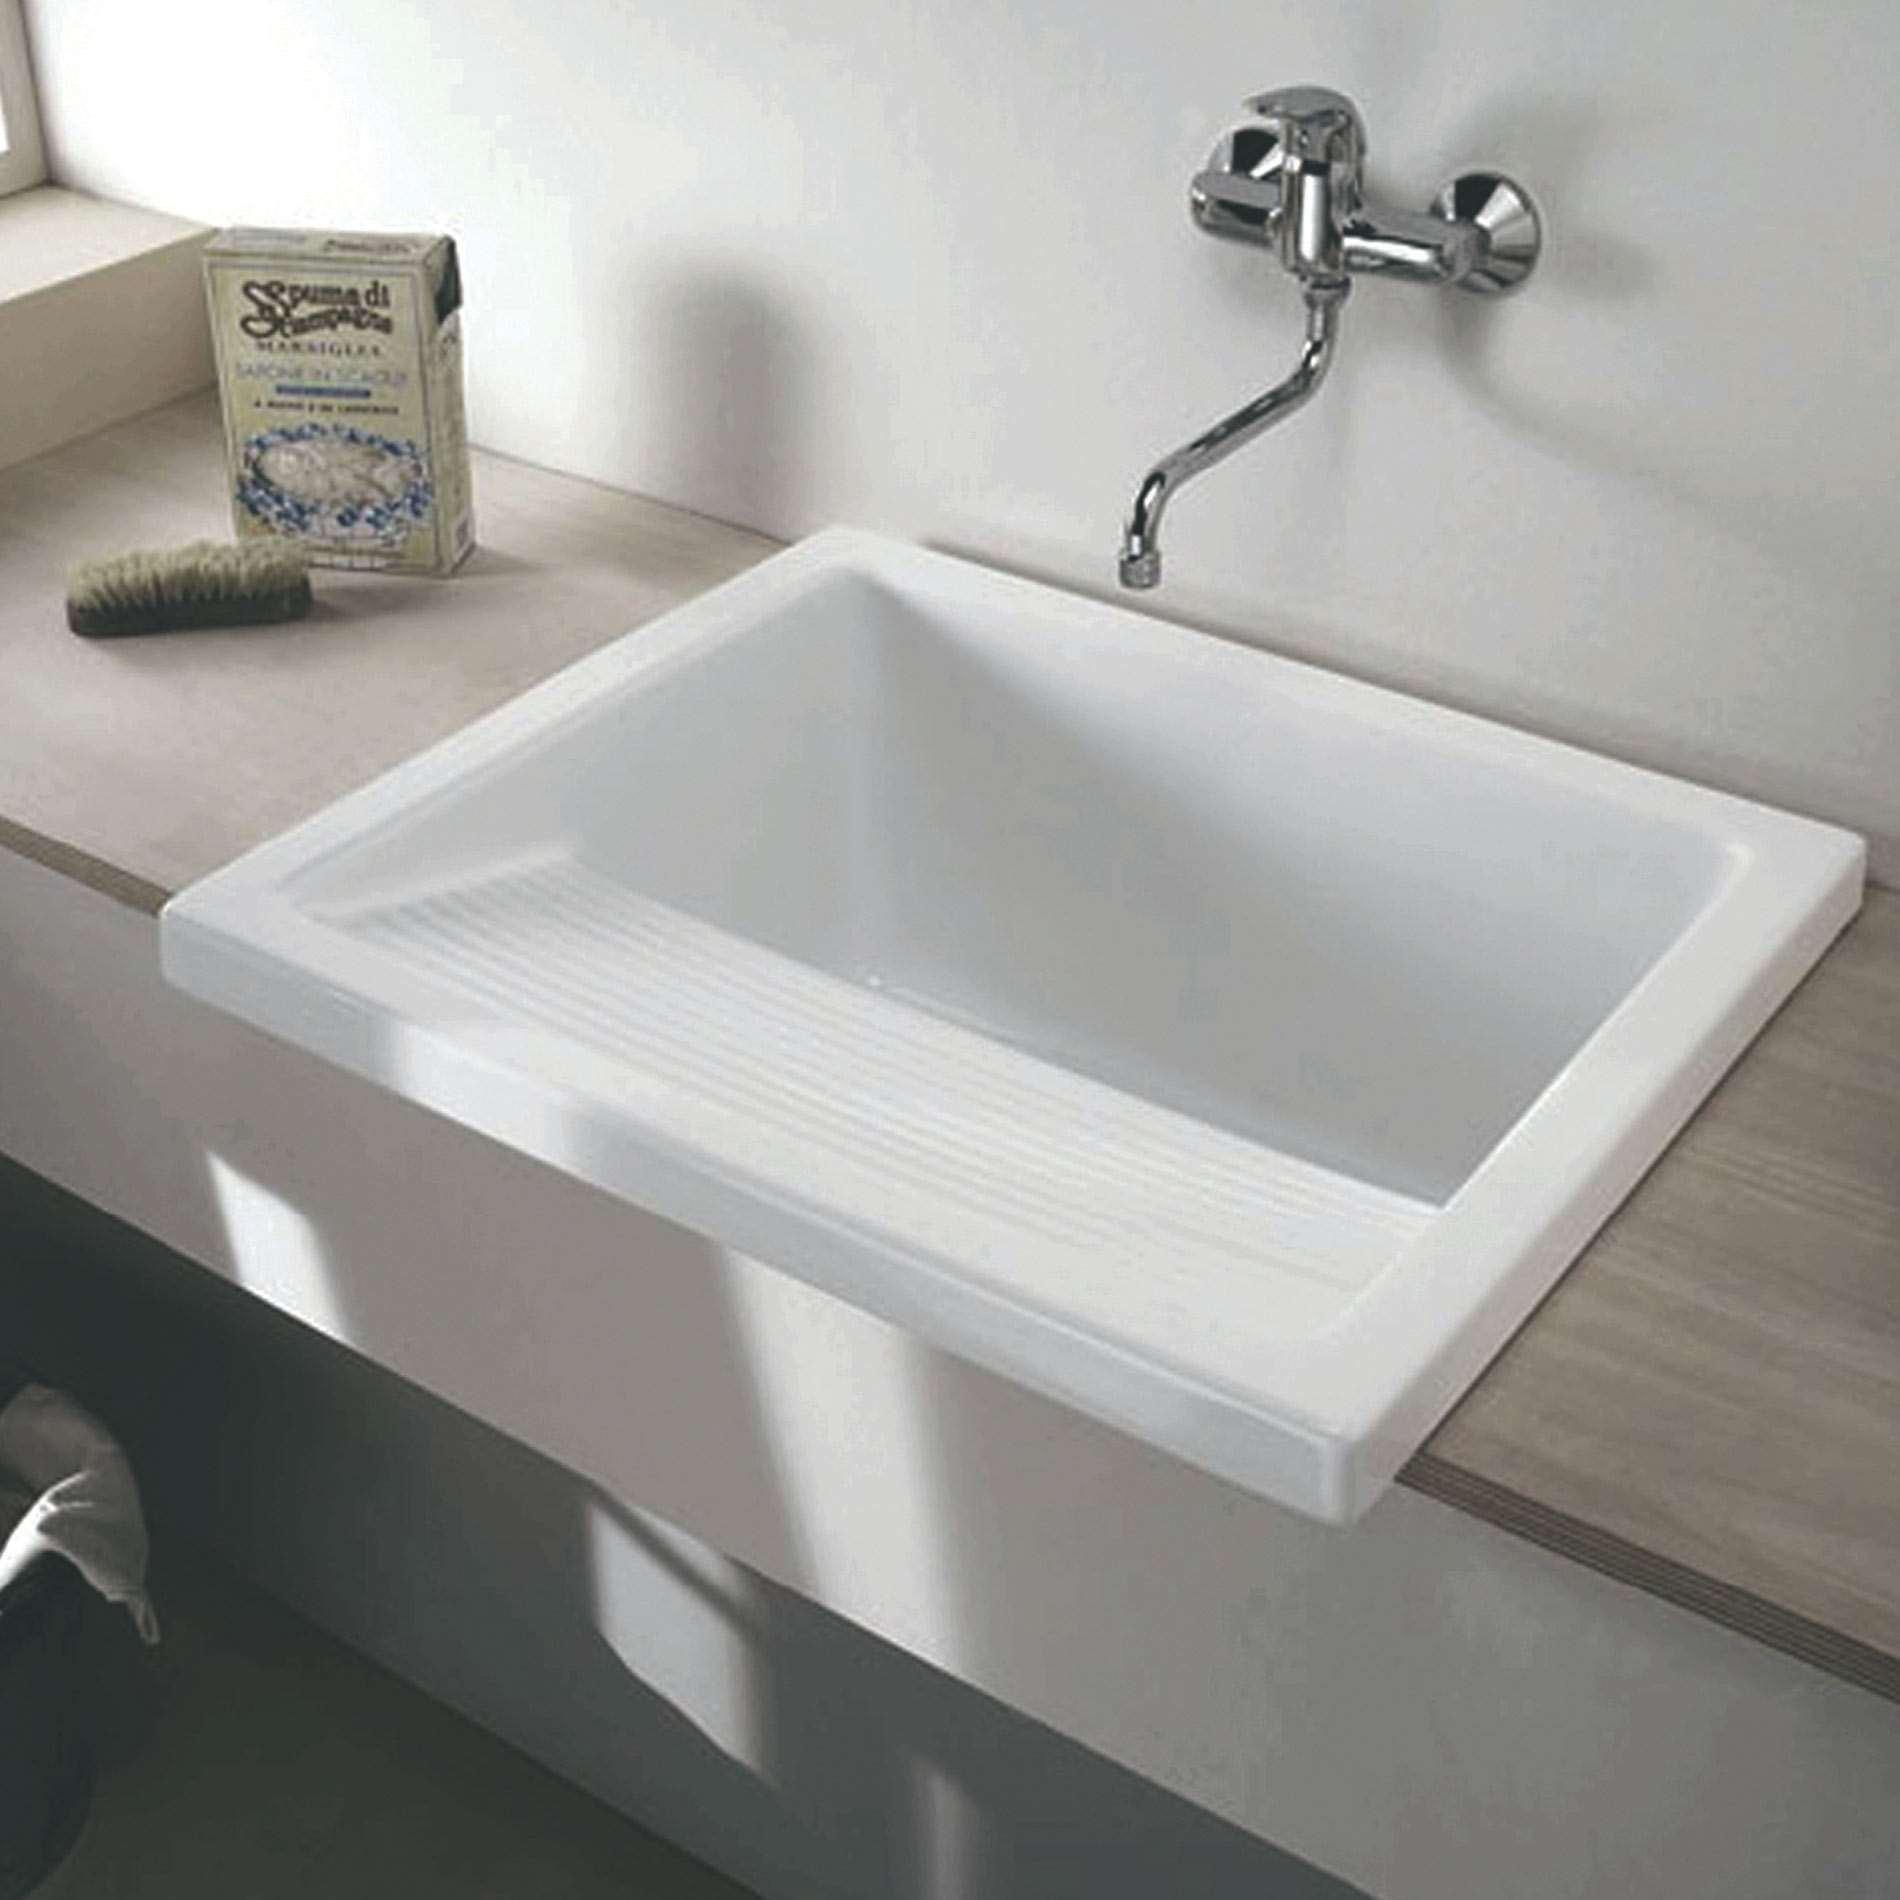 thomas denby: cll laundry ceramic sink - kitchen sinks & taps